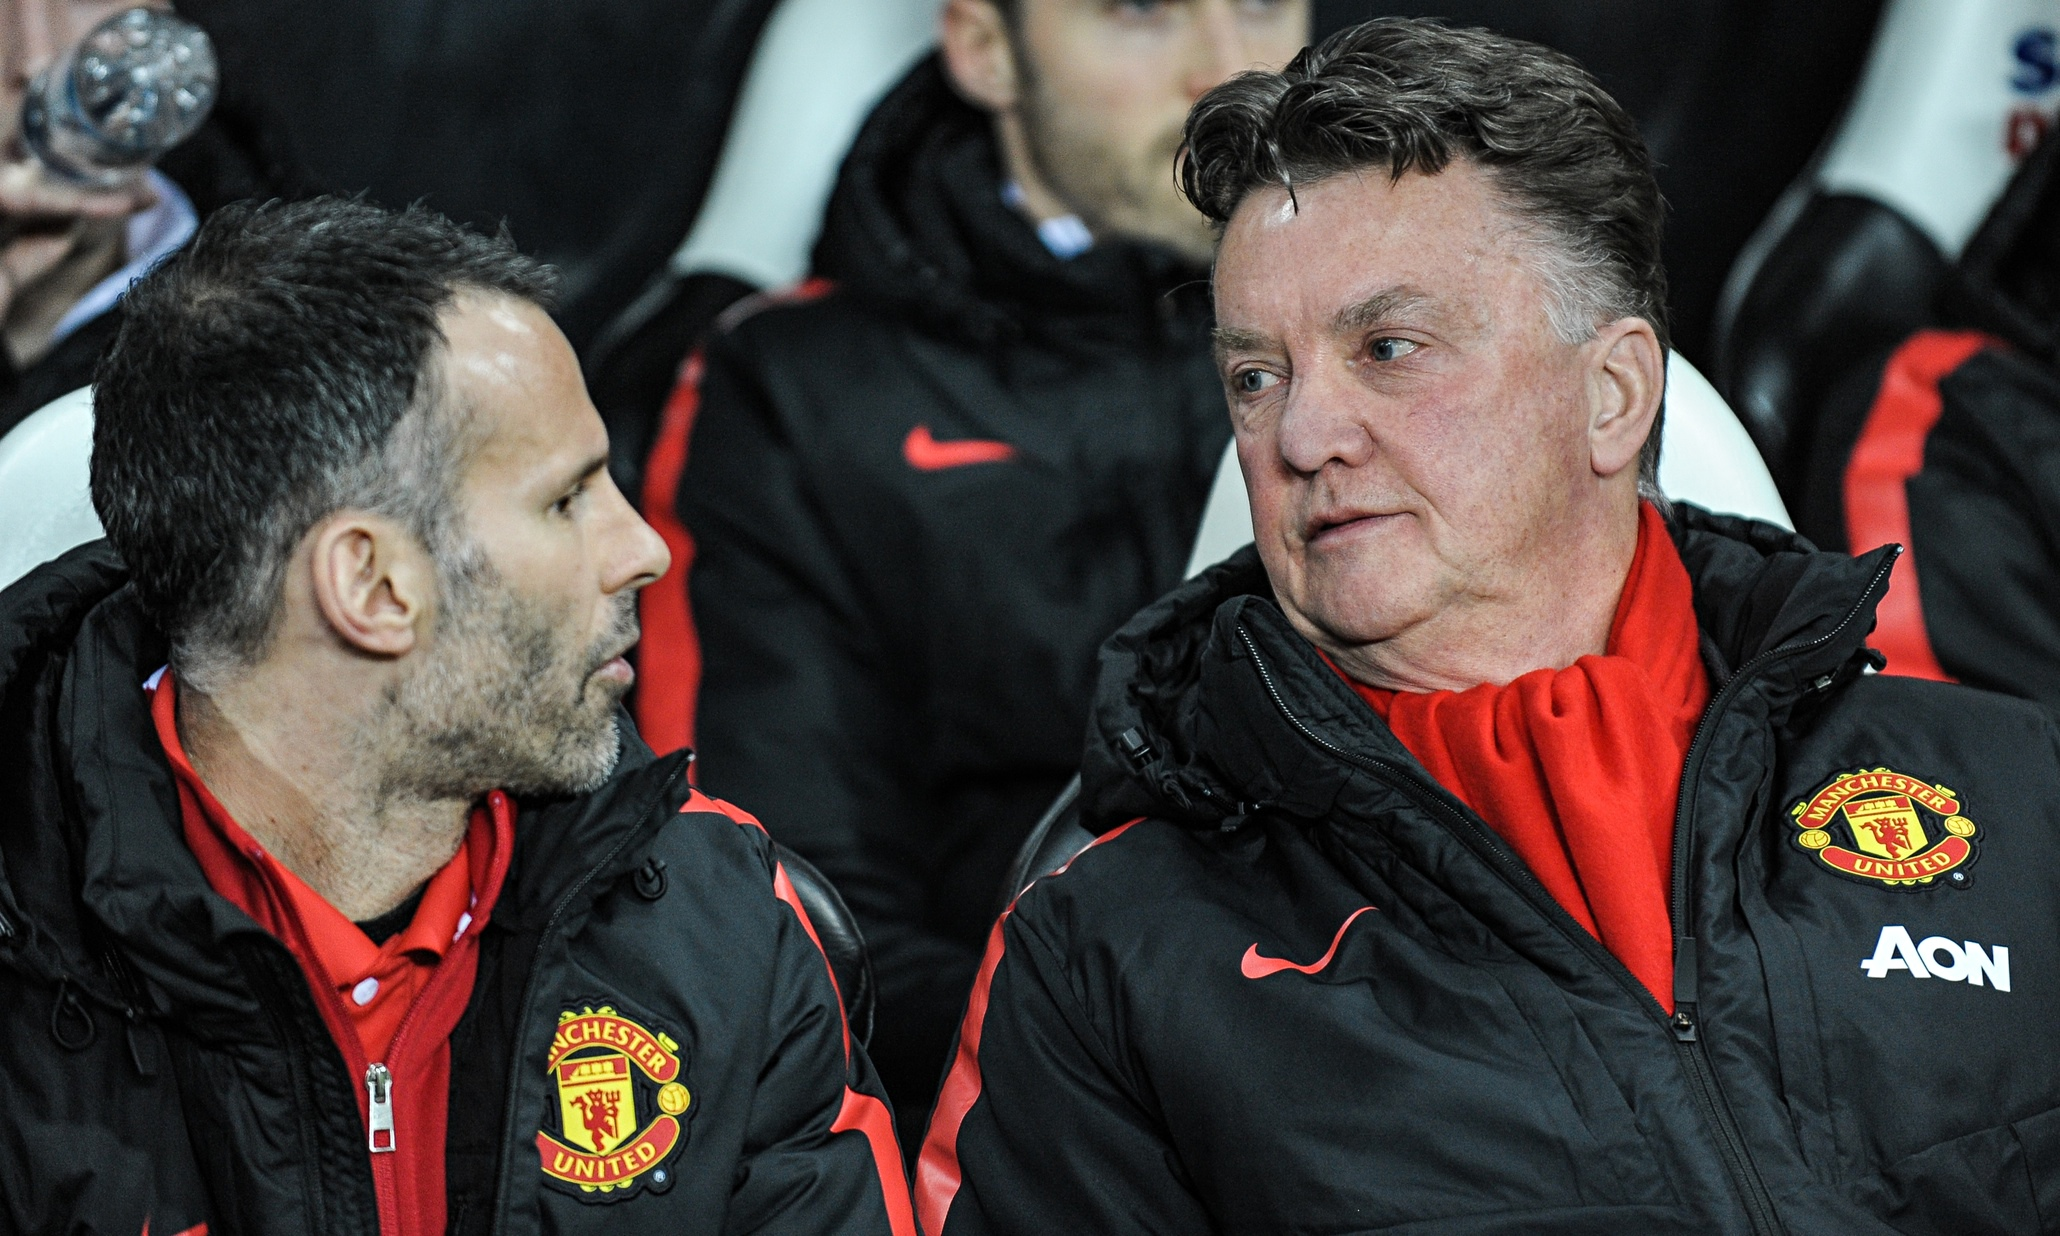 Louis Van Gaal Denies Rift With Manchester United